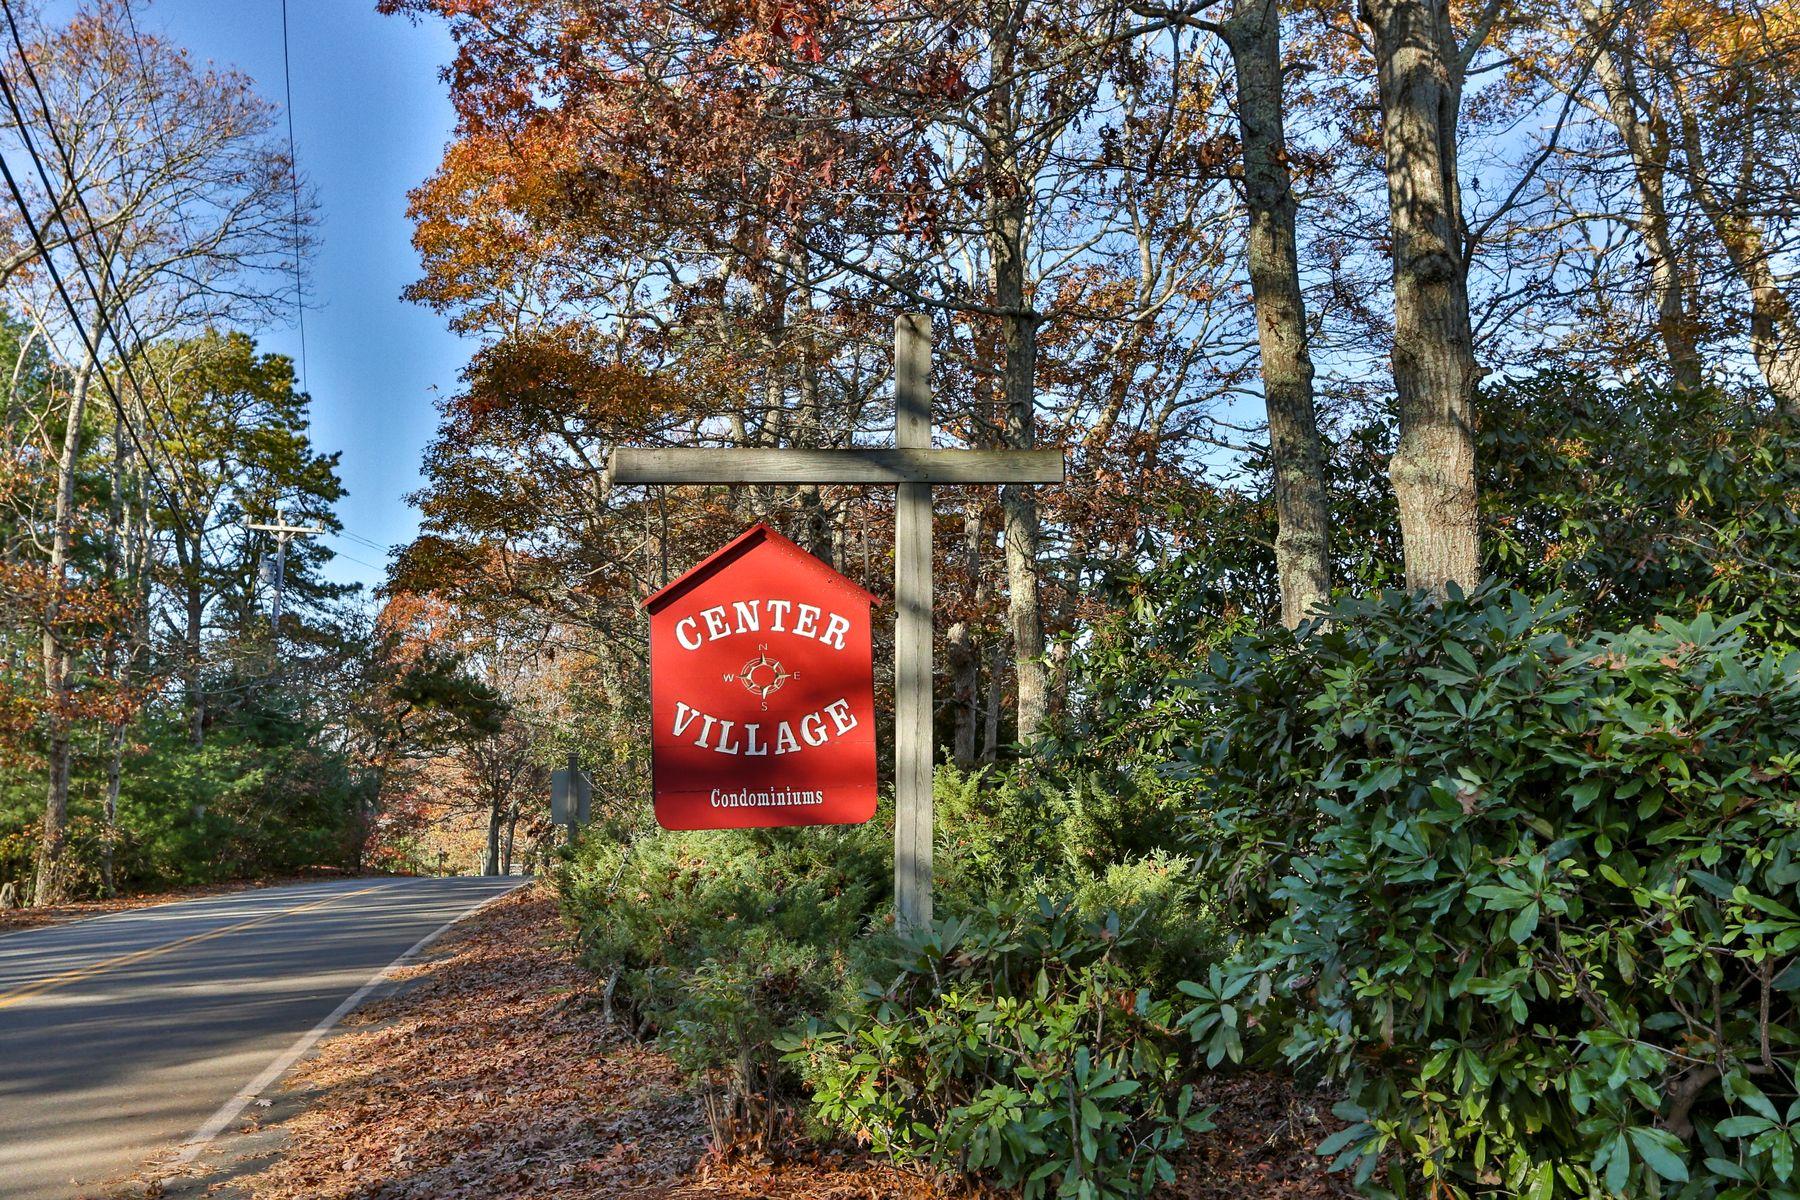 Condominiums 为 销售 在 58 Captain Cook Lane 森特维尔, 马萨诸塞州 02632 美国